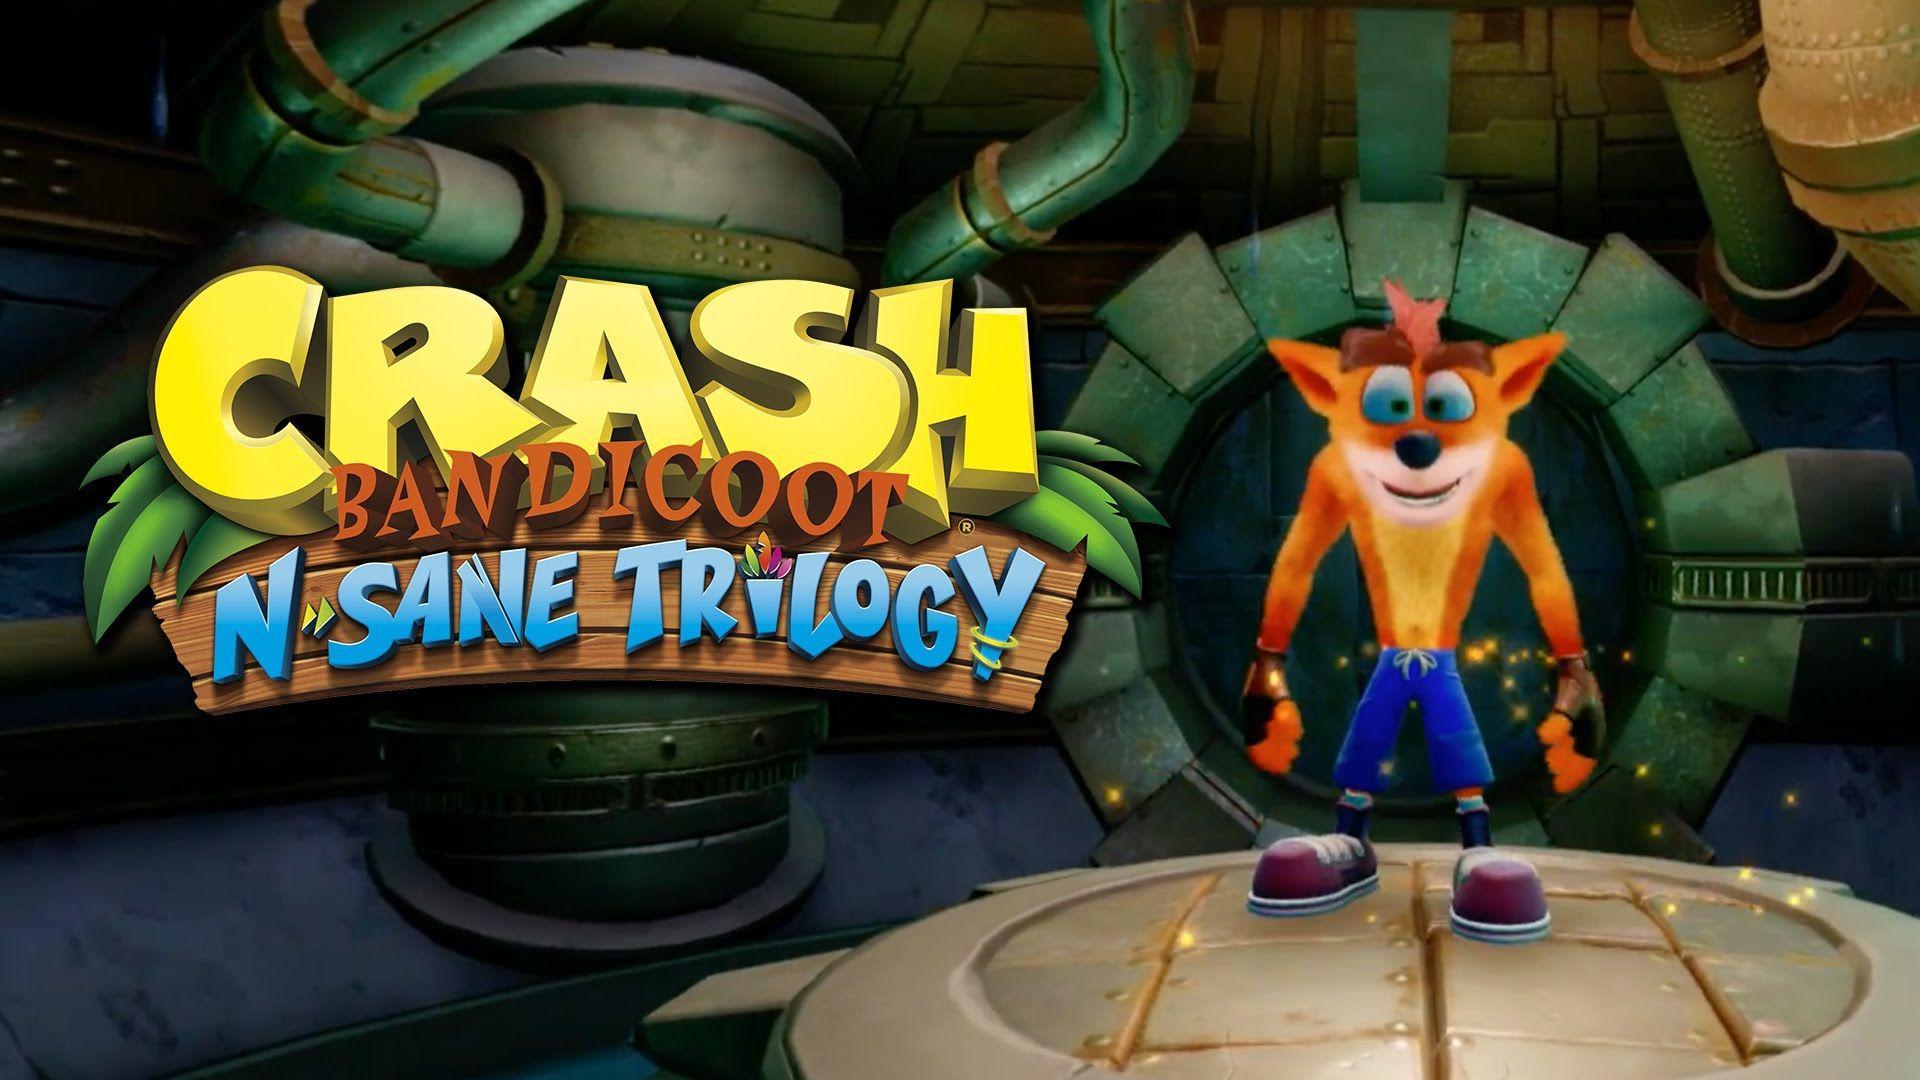 Crash Bandicoot N Sane Trilogy Wallpapers Wallpaper Cave